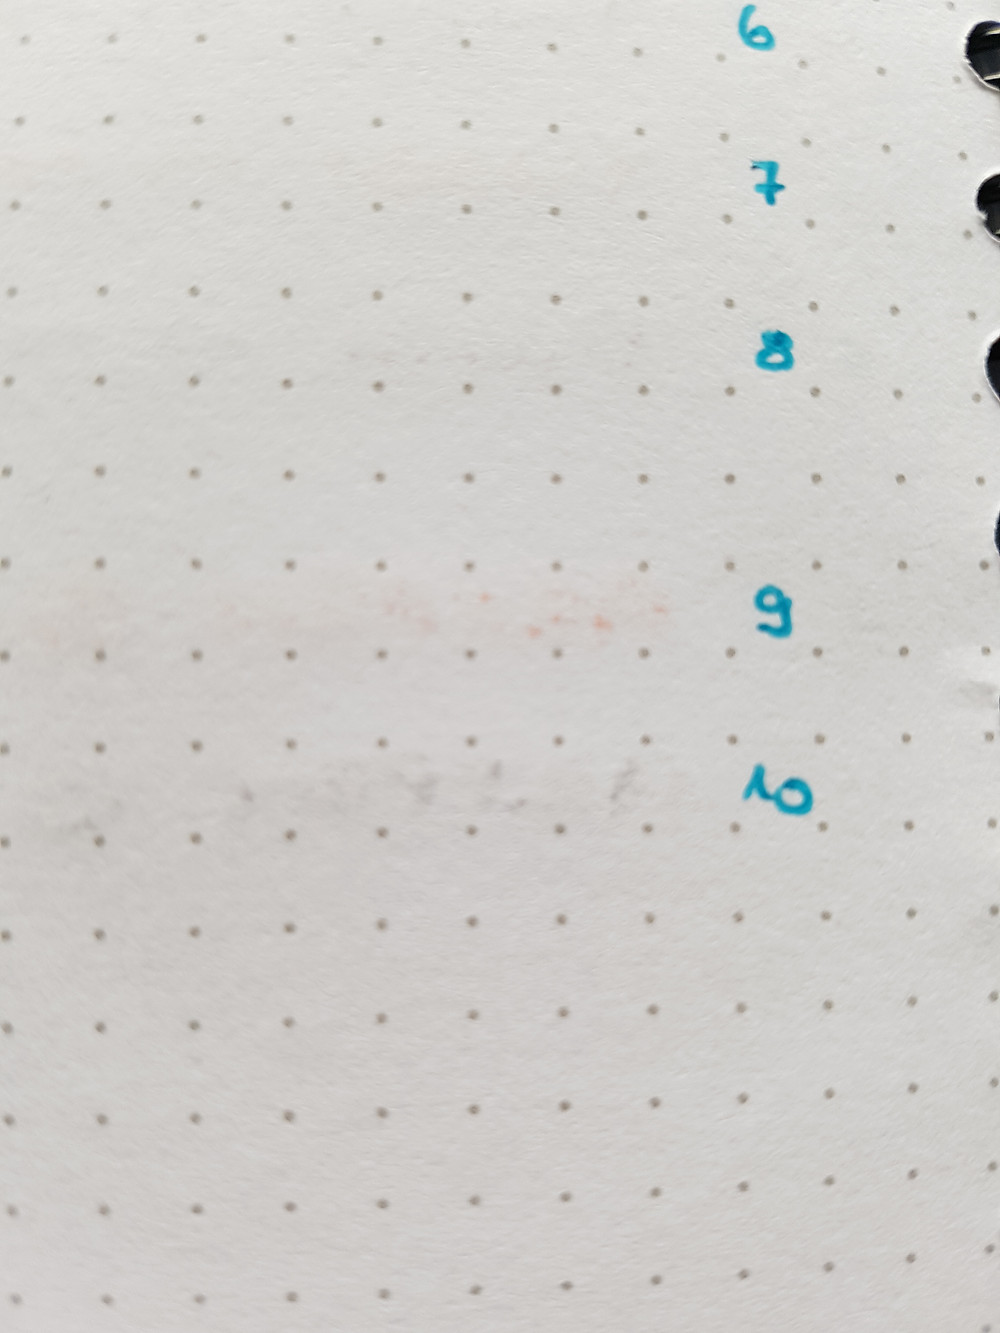 StickersSwissMade - blogpost - paper and pen test nbr 4 -  dotgrid.co notebooks_12